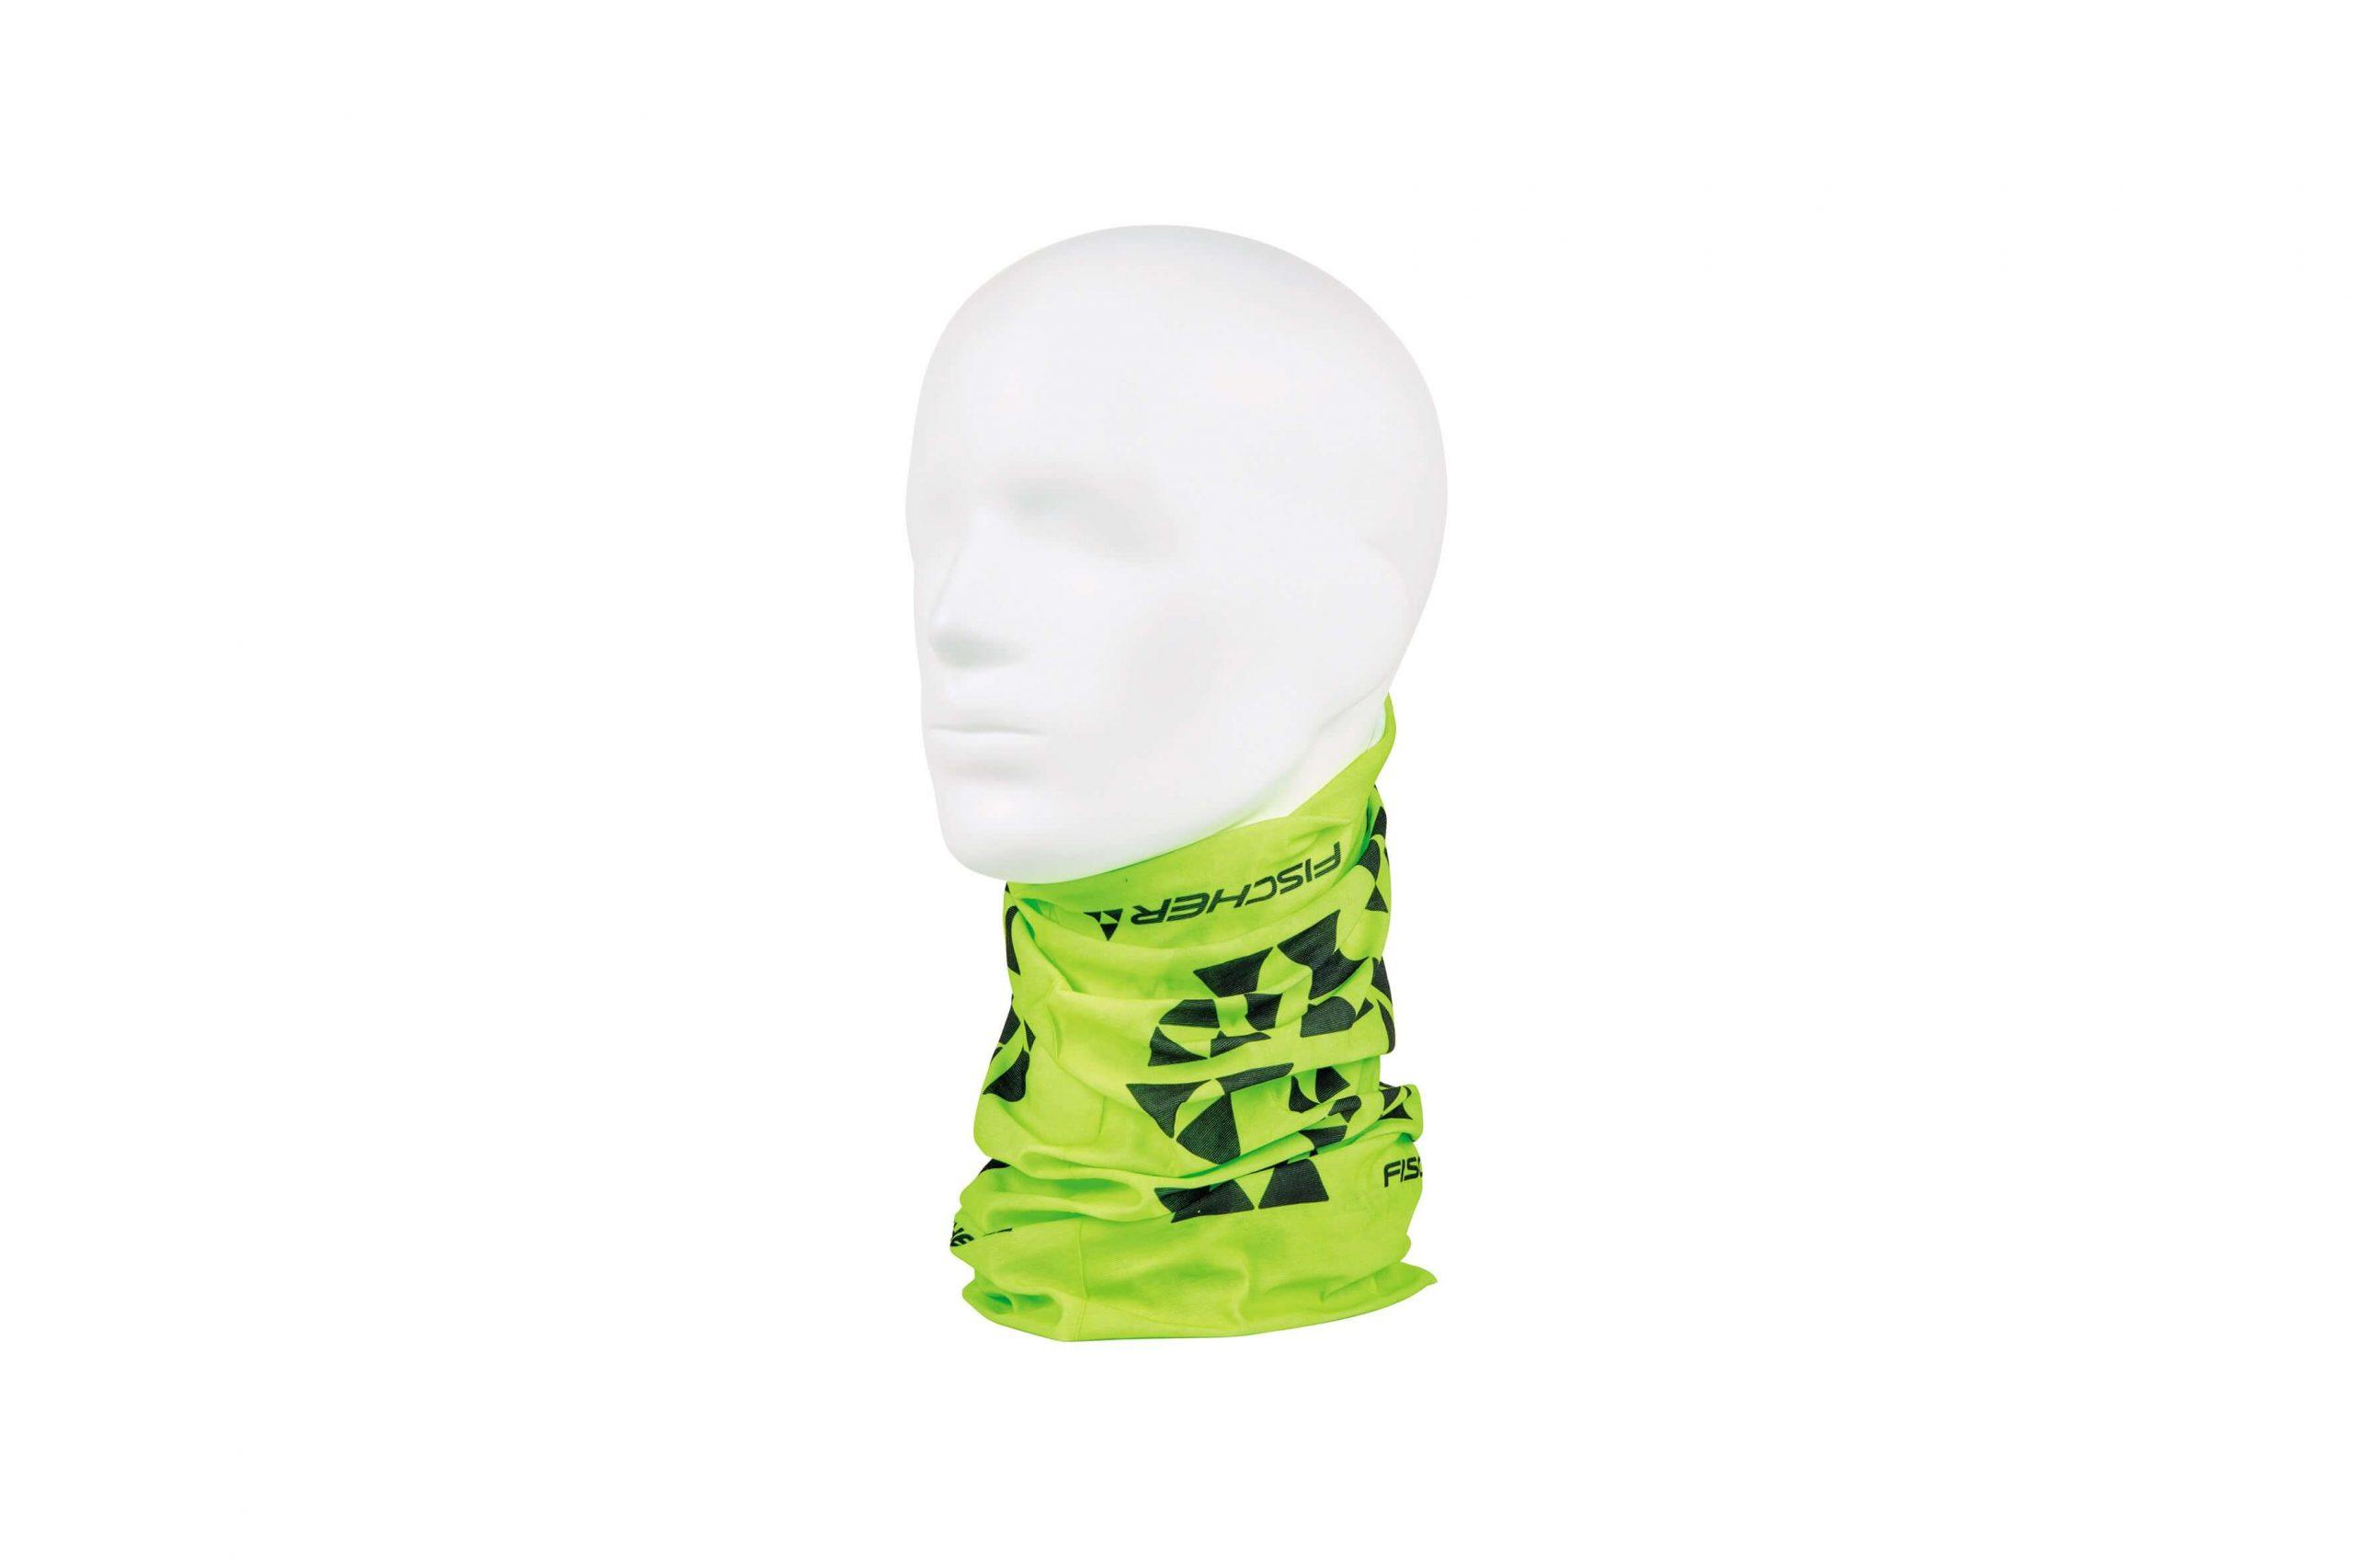 bandana fischer ischgl yellow